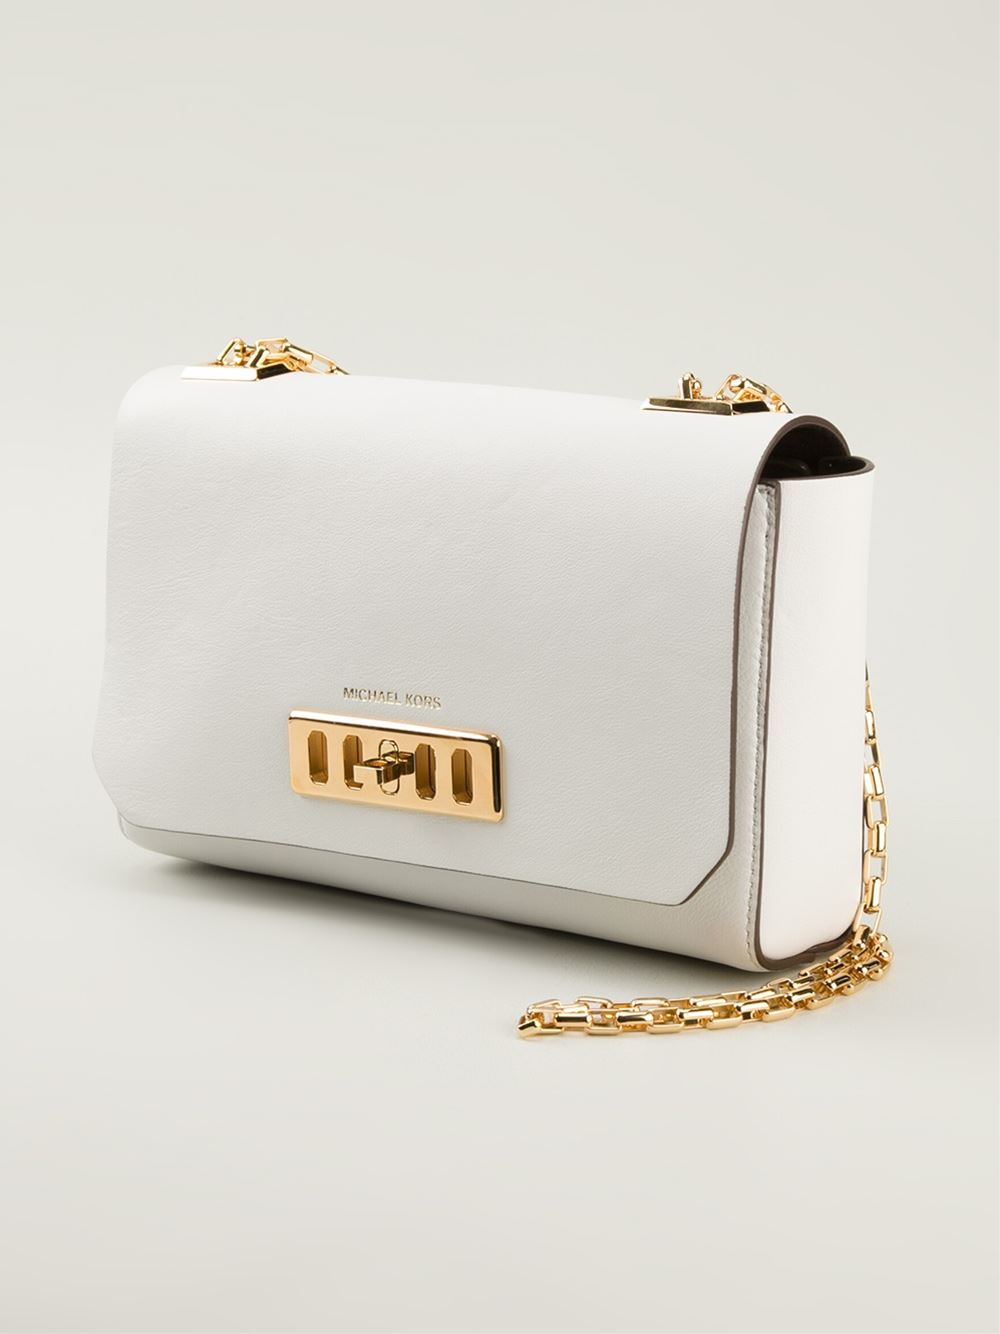 michael kors white handbag gold chain